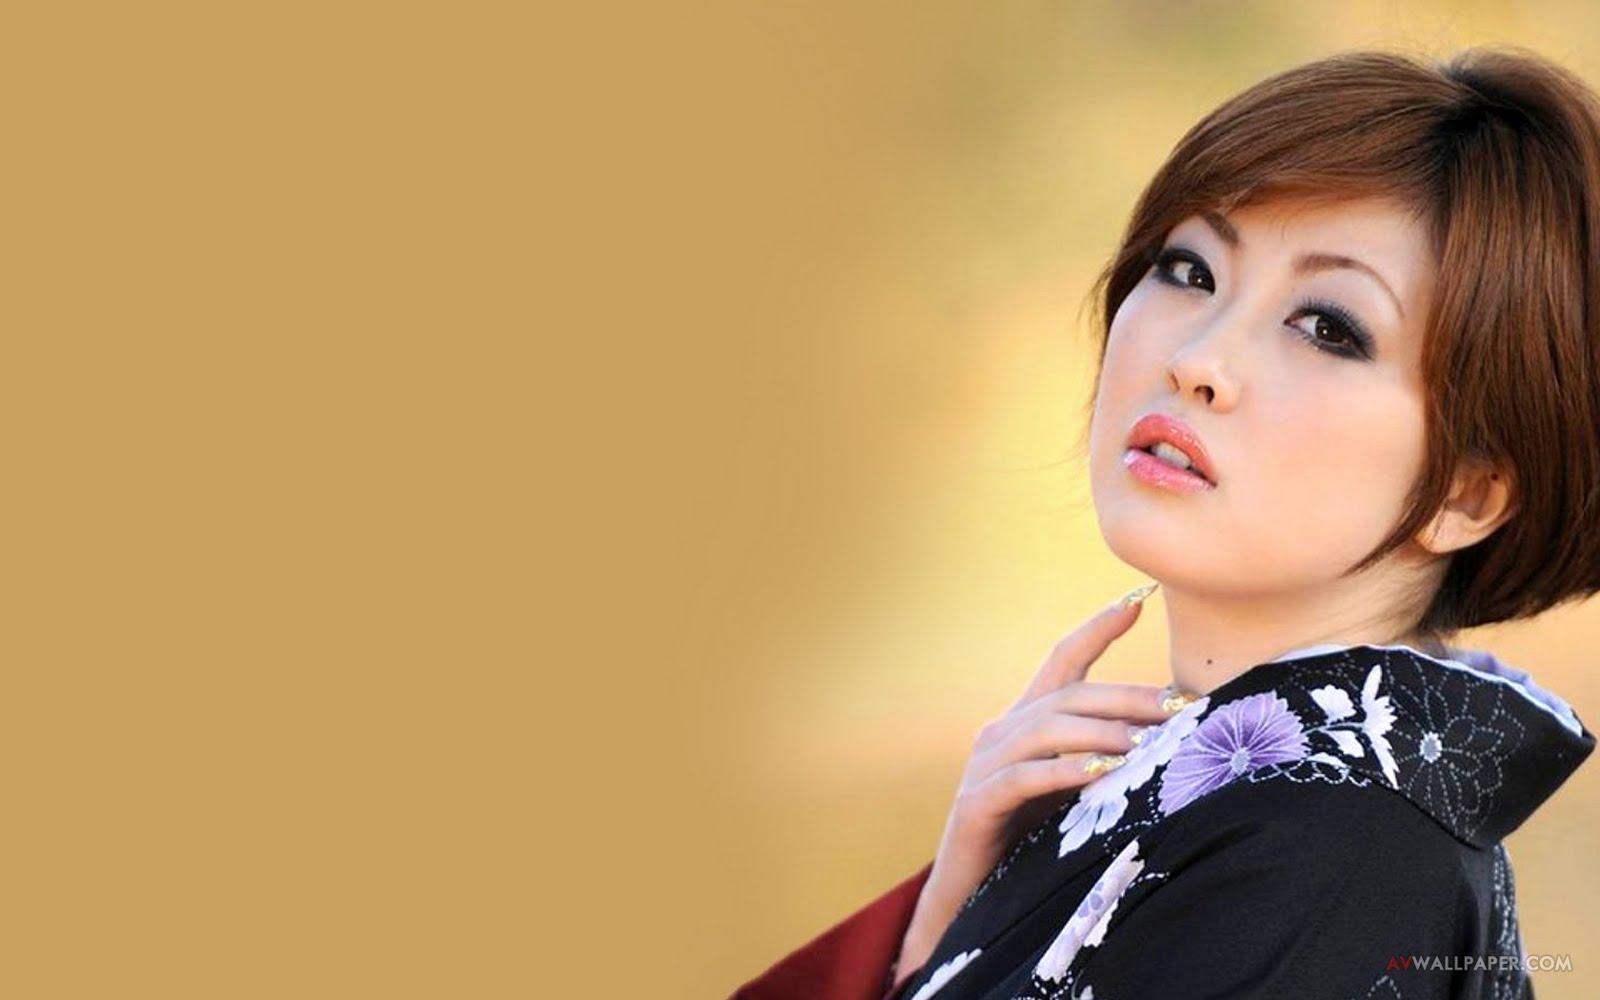 Rio Hamasaki Em 11 de junho nasceu Rio Nanasaki, atriz japonesa